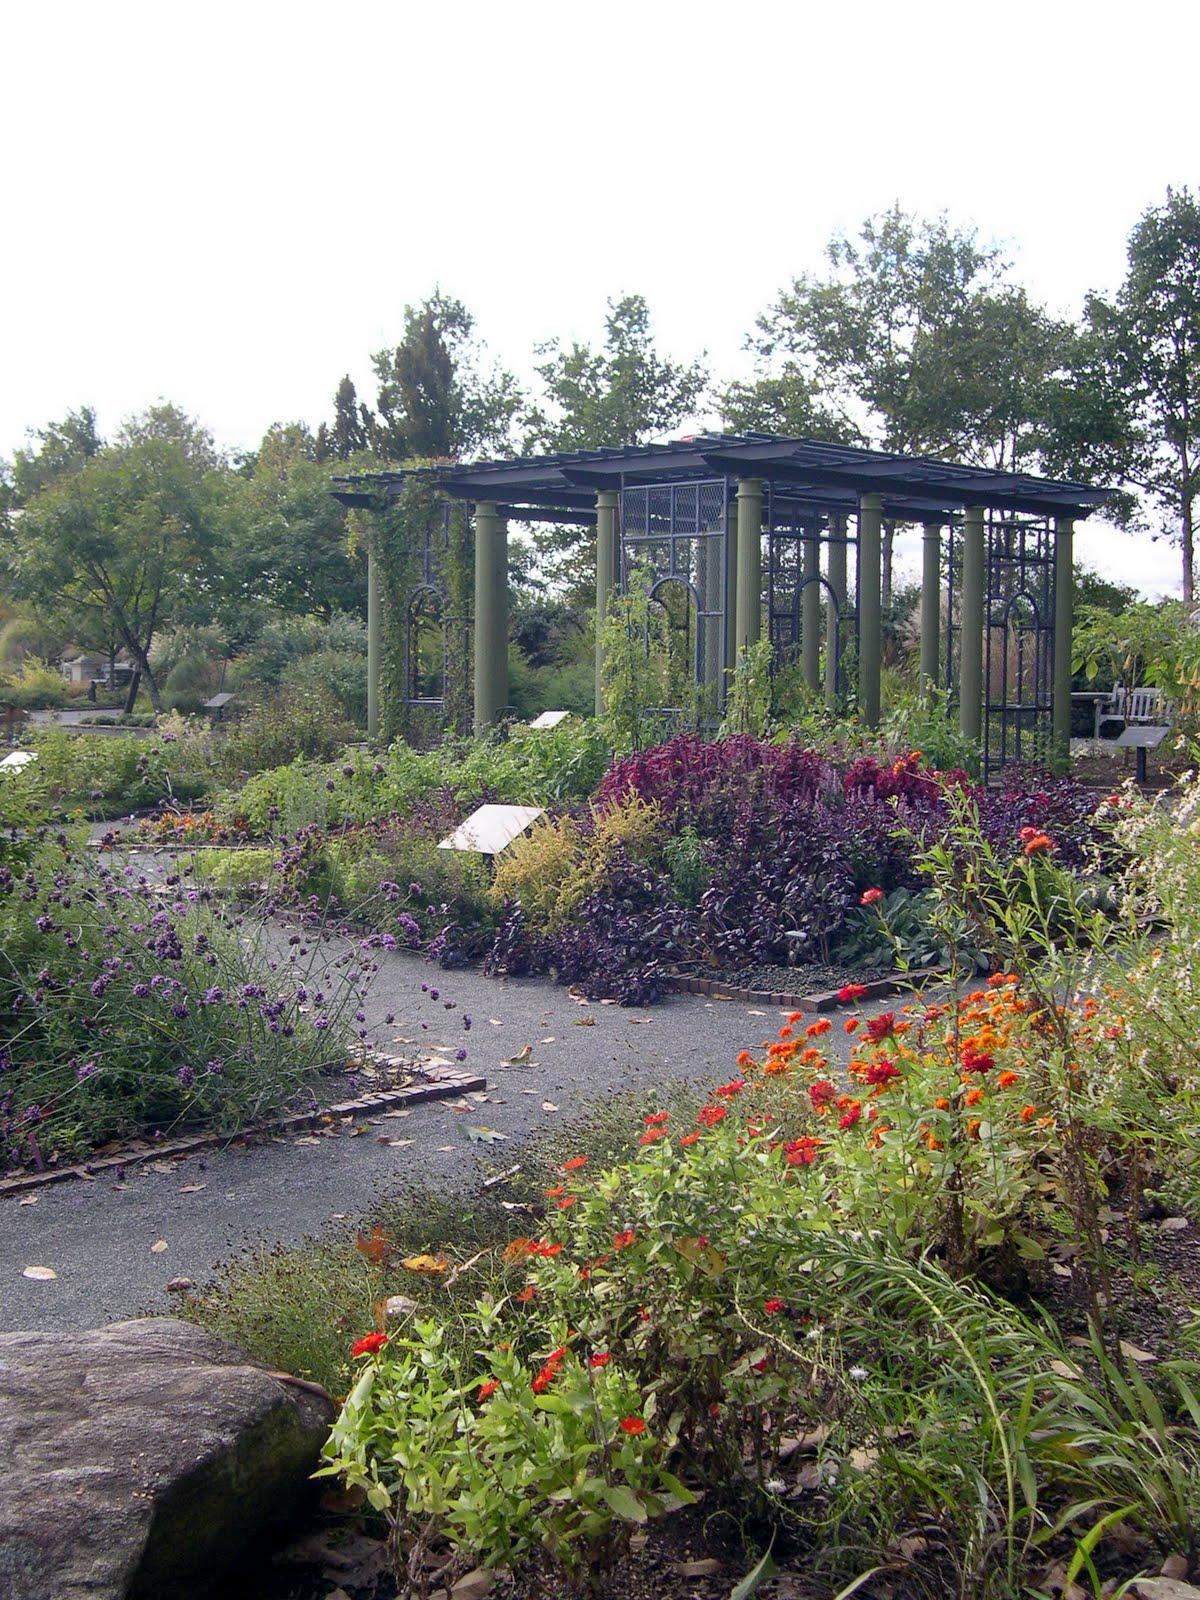 47901 as well Botanical Garden also Watch likewise Restaurants Near Cruise Port likewise Top Botanical Gardens In America. on 12ba7